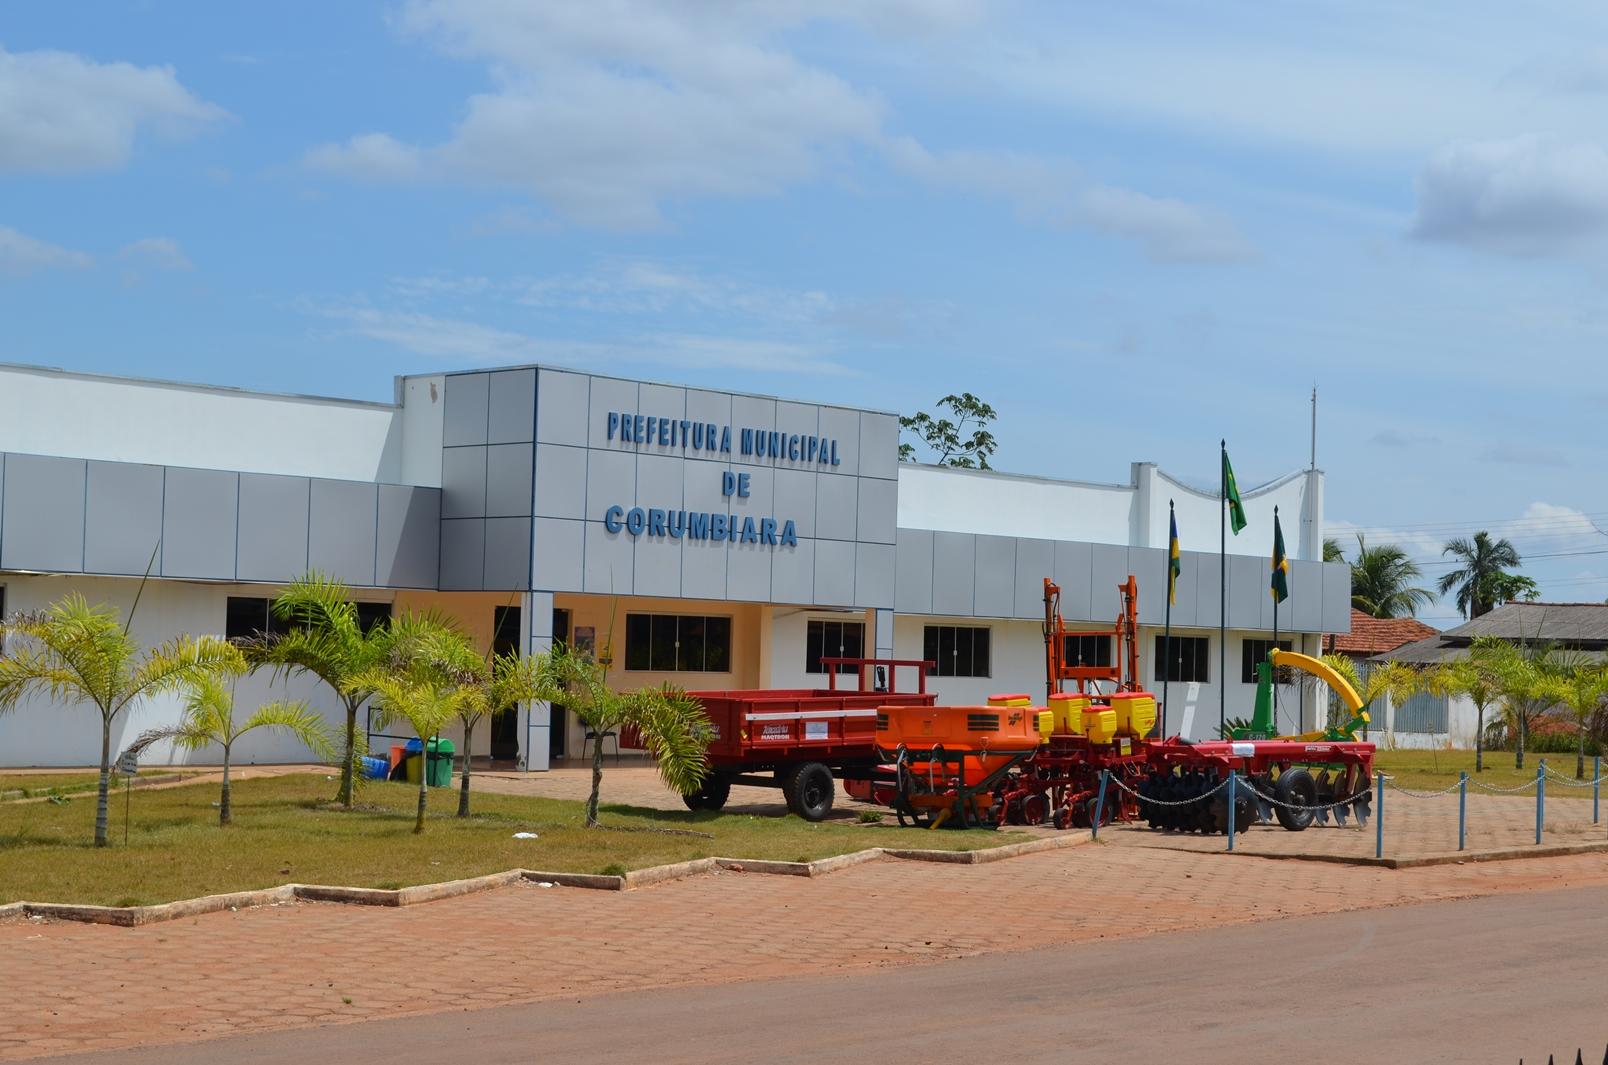 Corumbiara Rondônia fonte: s.glbimg.com